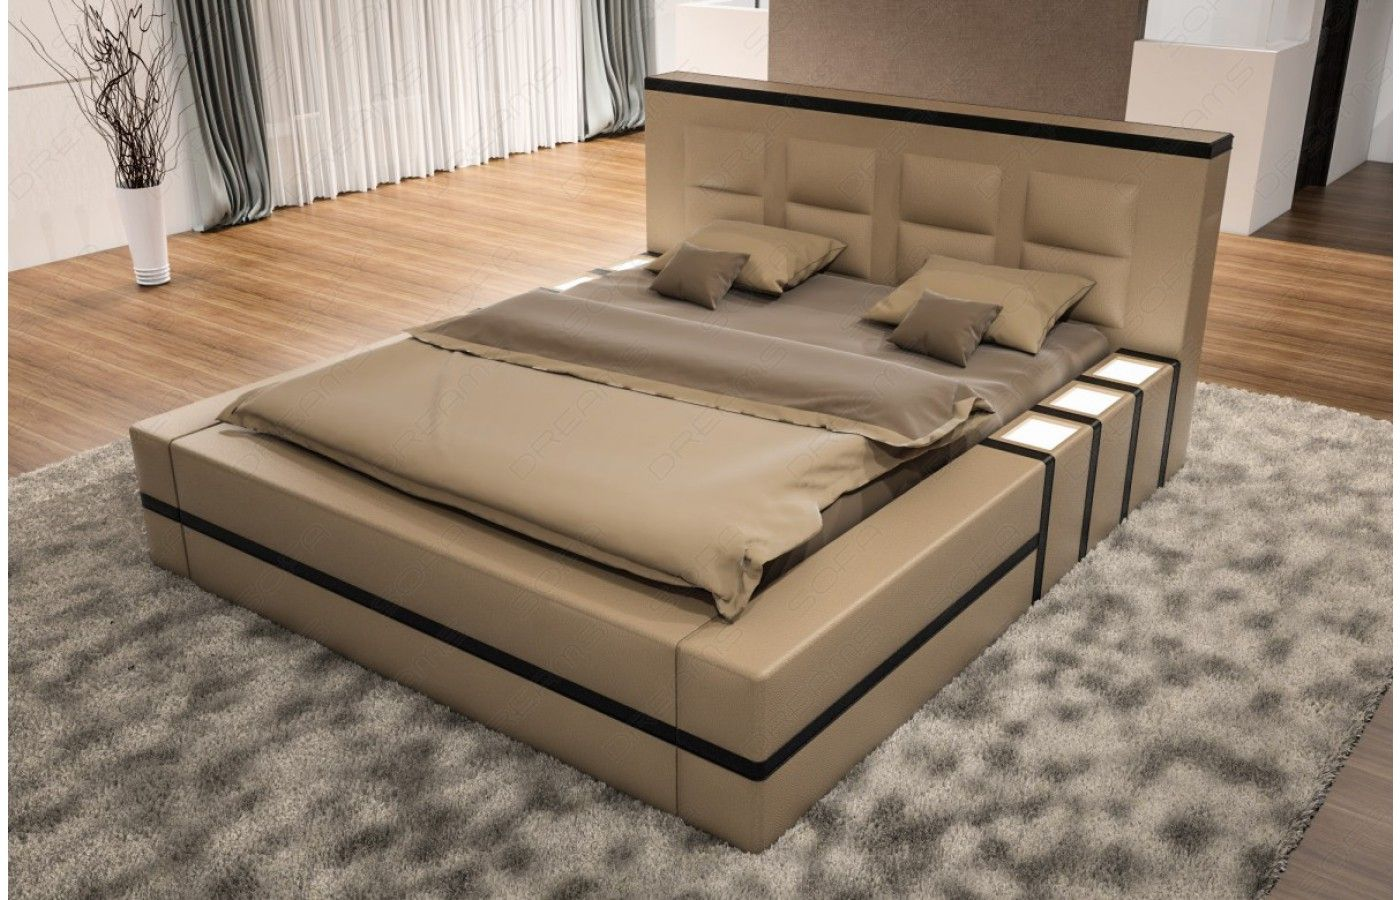 Polsterbett Asti Mit Beleuchtung Bed Furniture Design Bed Back Design Bed Design Modern